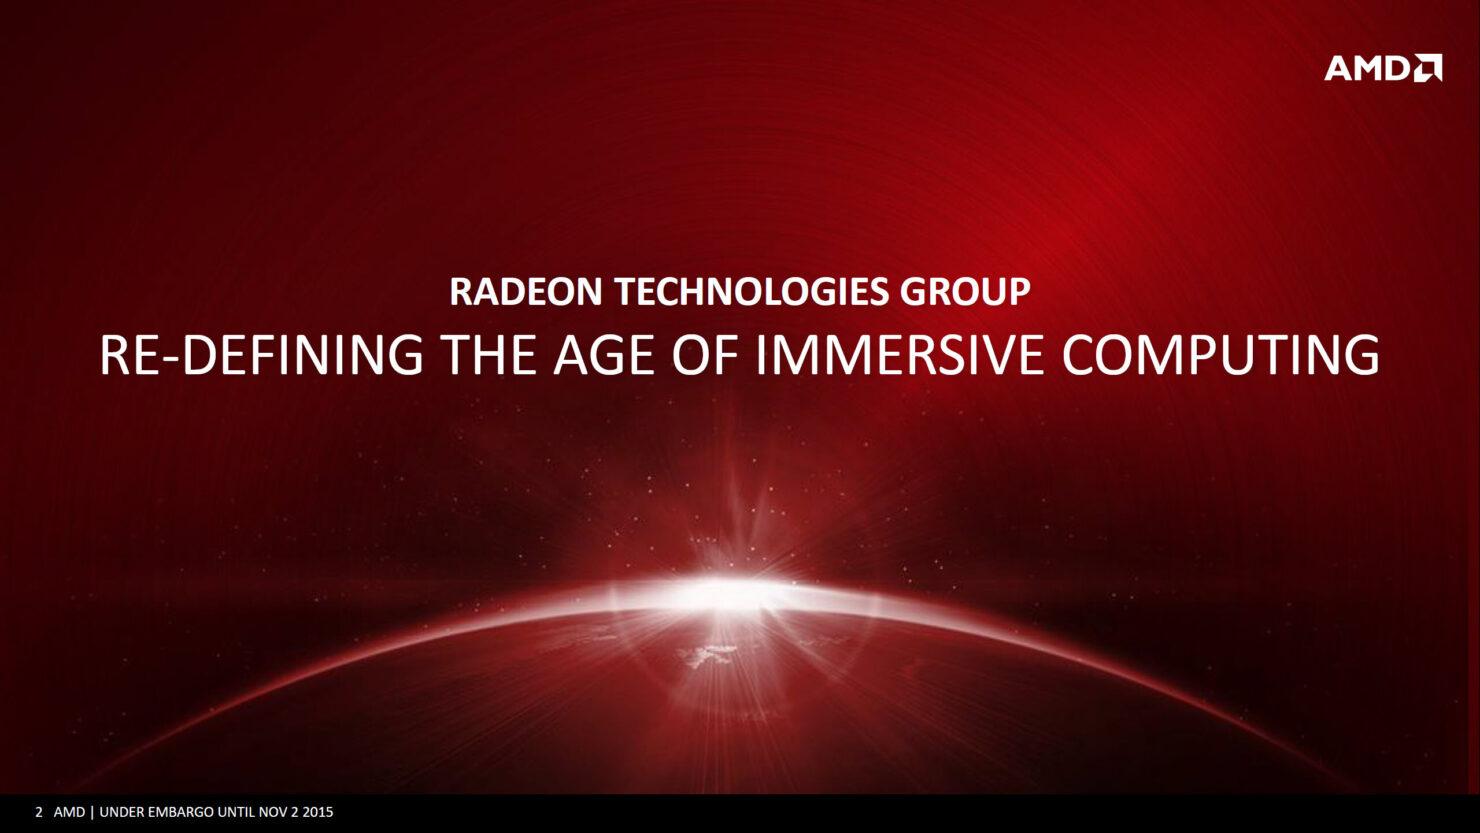 amd-radeon_crimson-driver_new-era